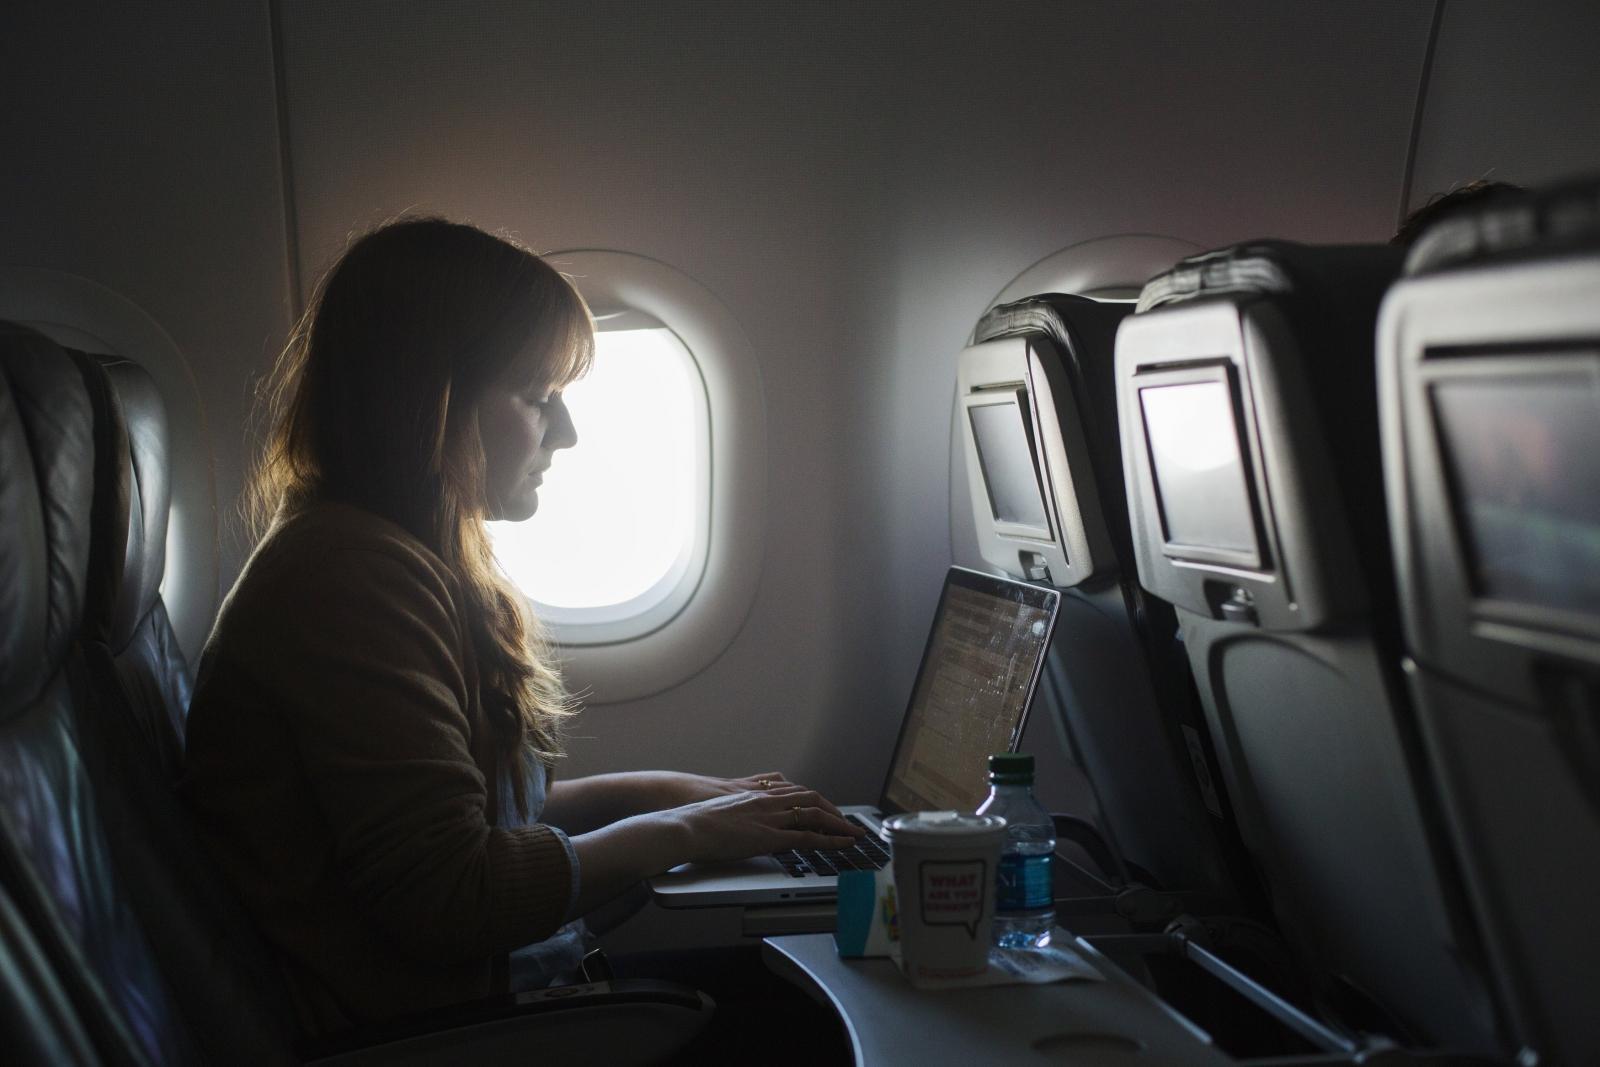 US to ban laptops on Europe flights